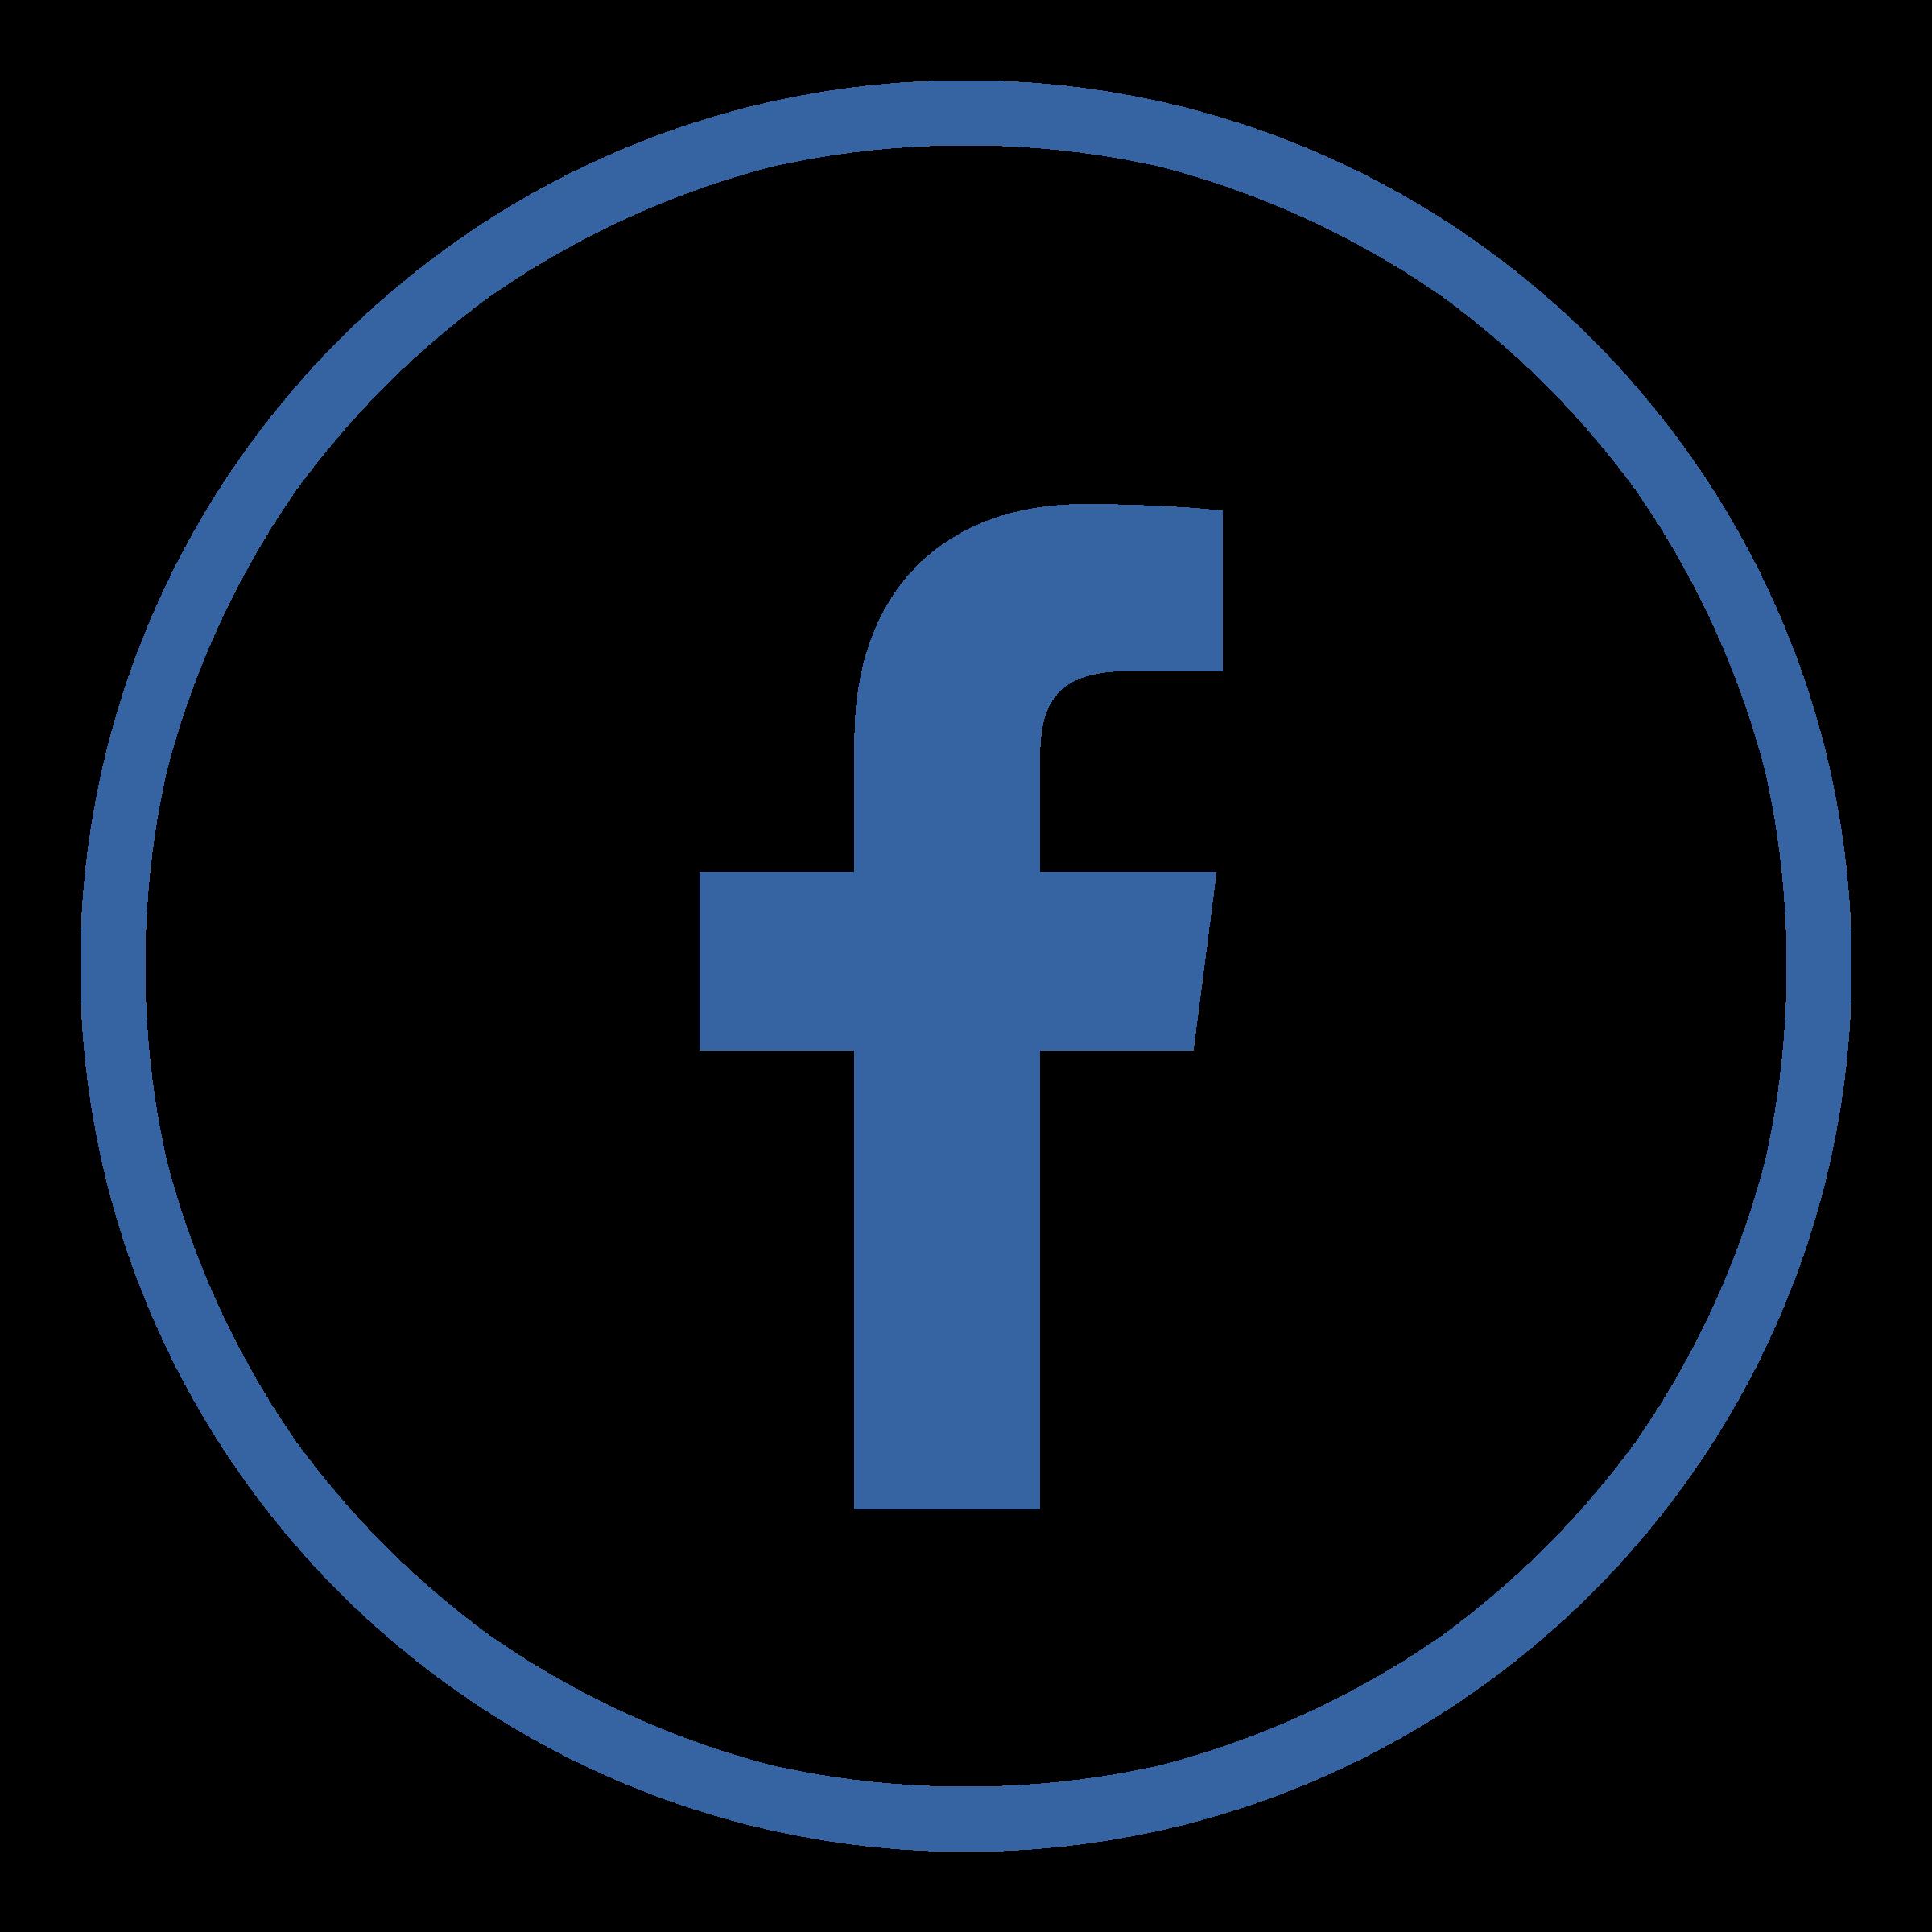 Facebook Logo PNG, Free Download Logo Facebook Clipart - Free Transparent  PNG Logos